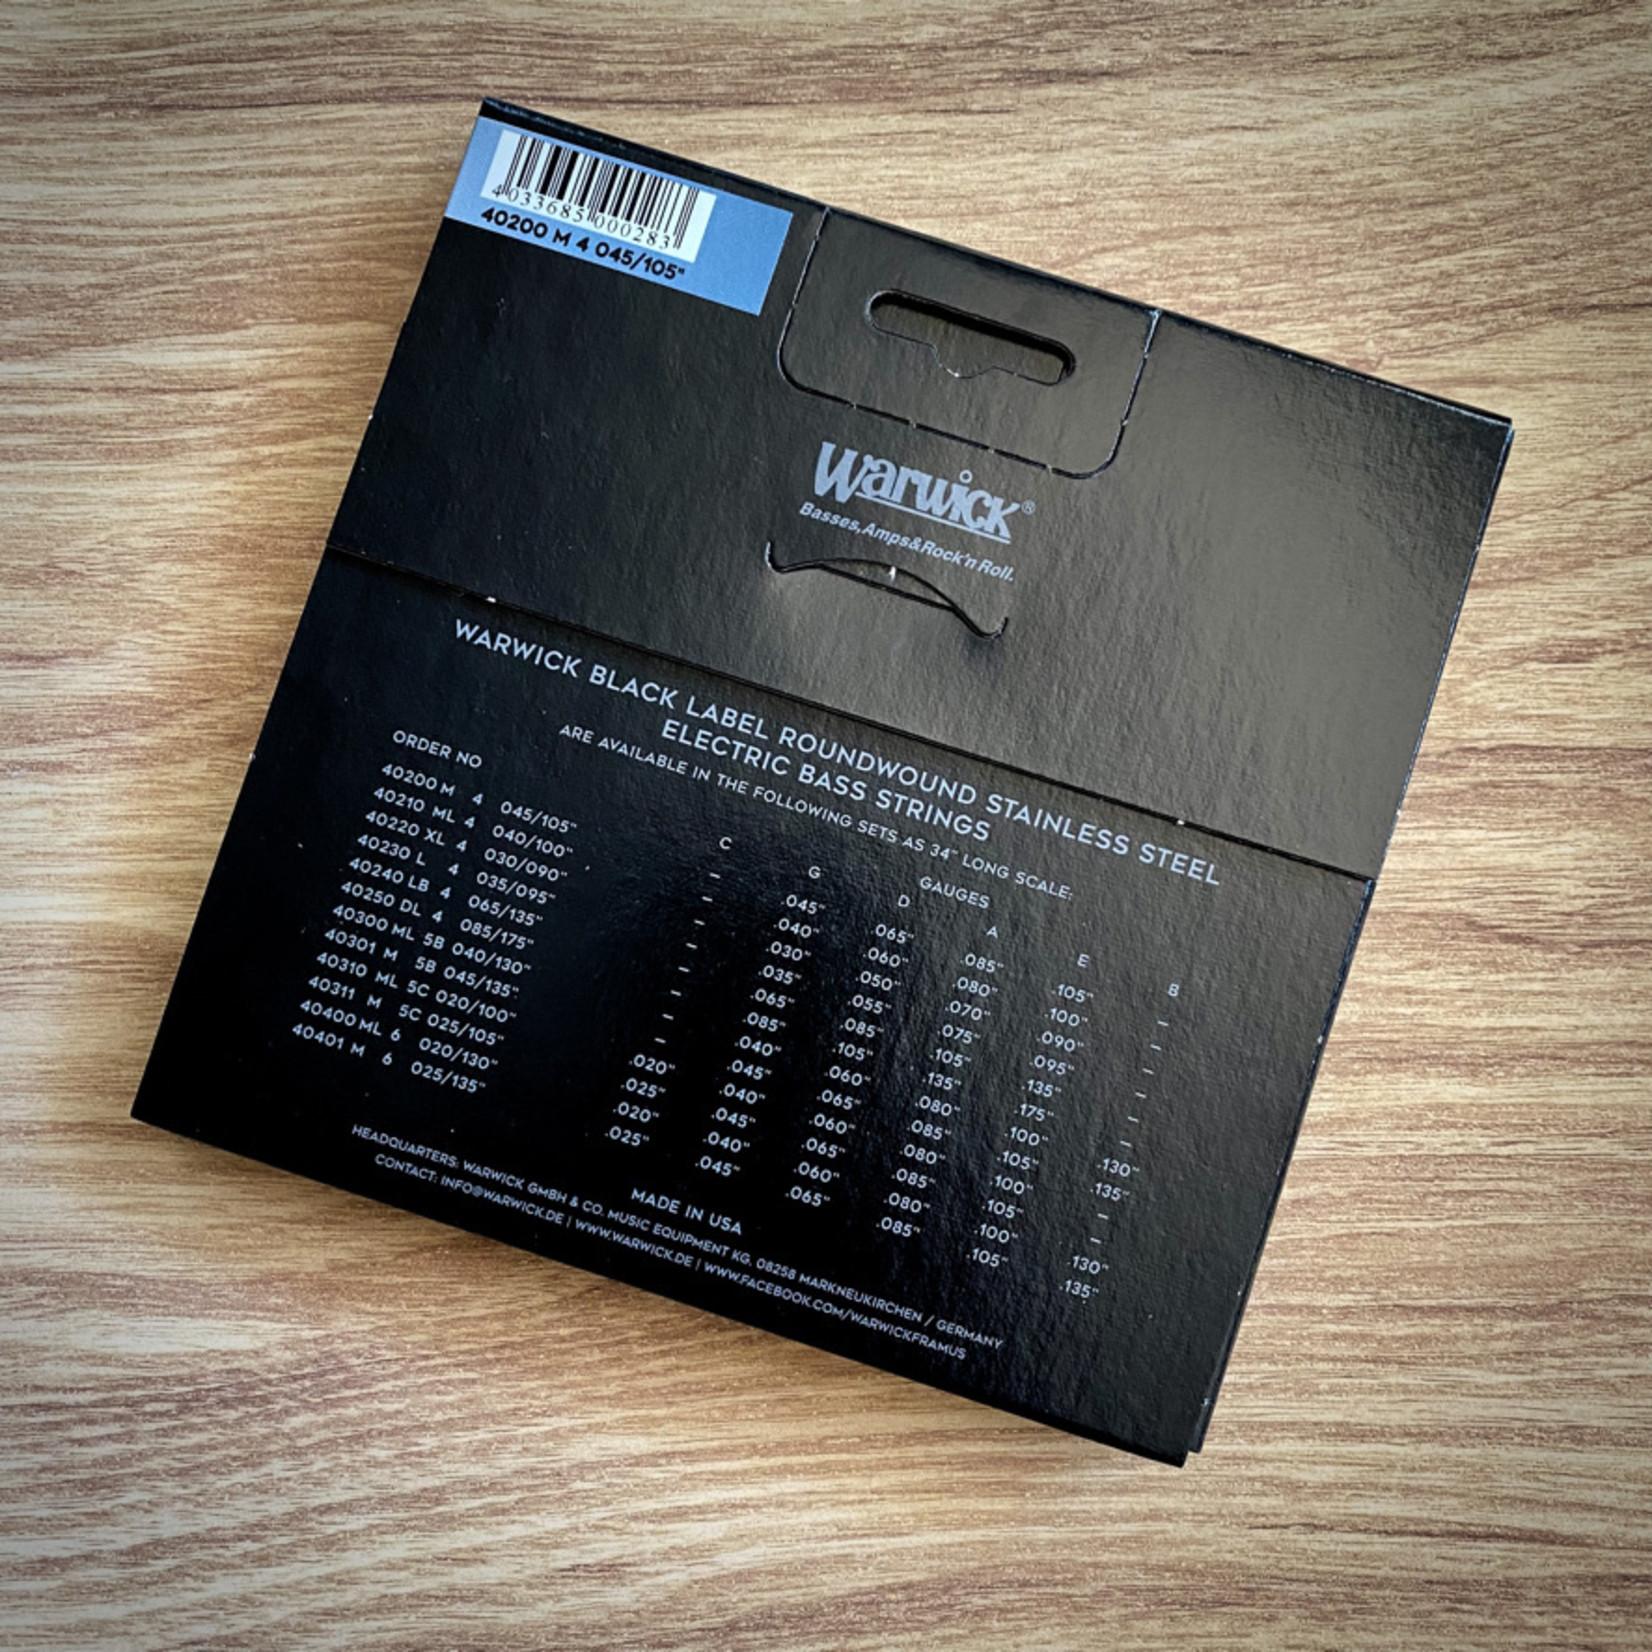 Warwick Warwick Black Label Bass Strings 4-String (Long Scale) Set, Medium 045/105 (40200 M 4)